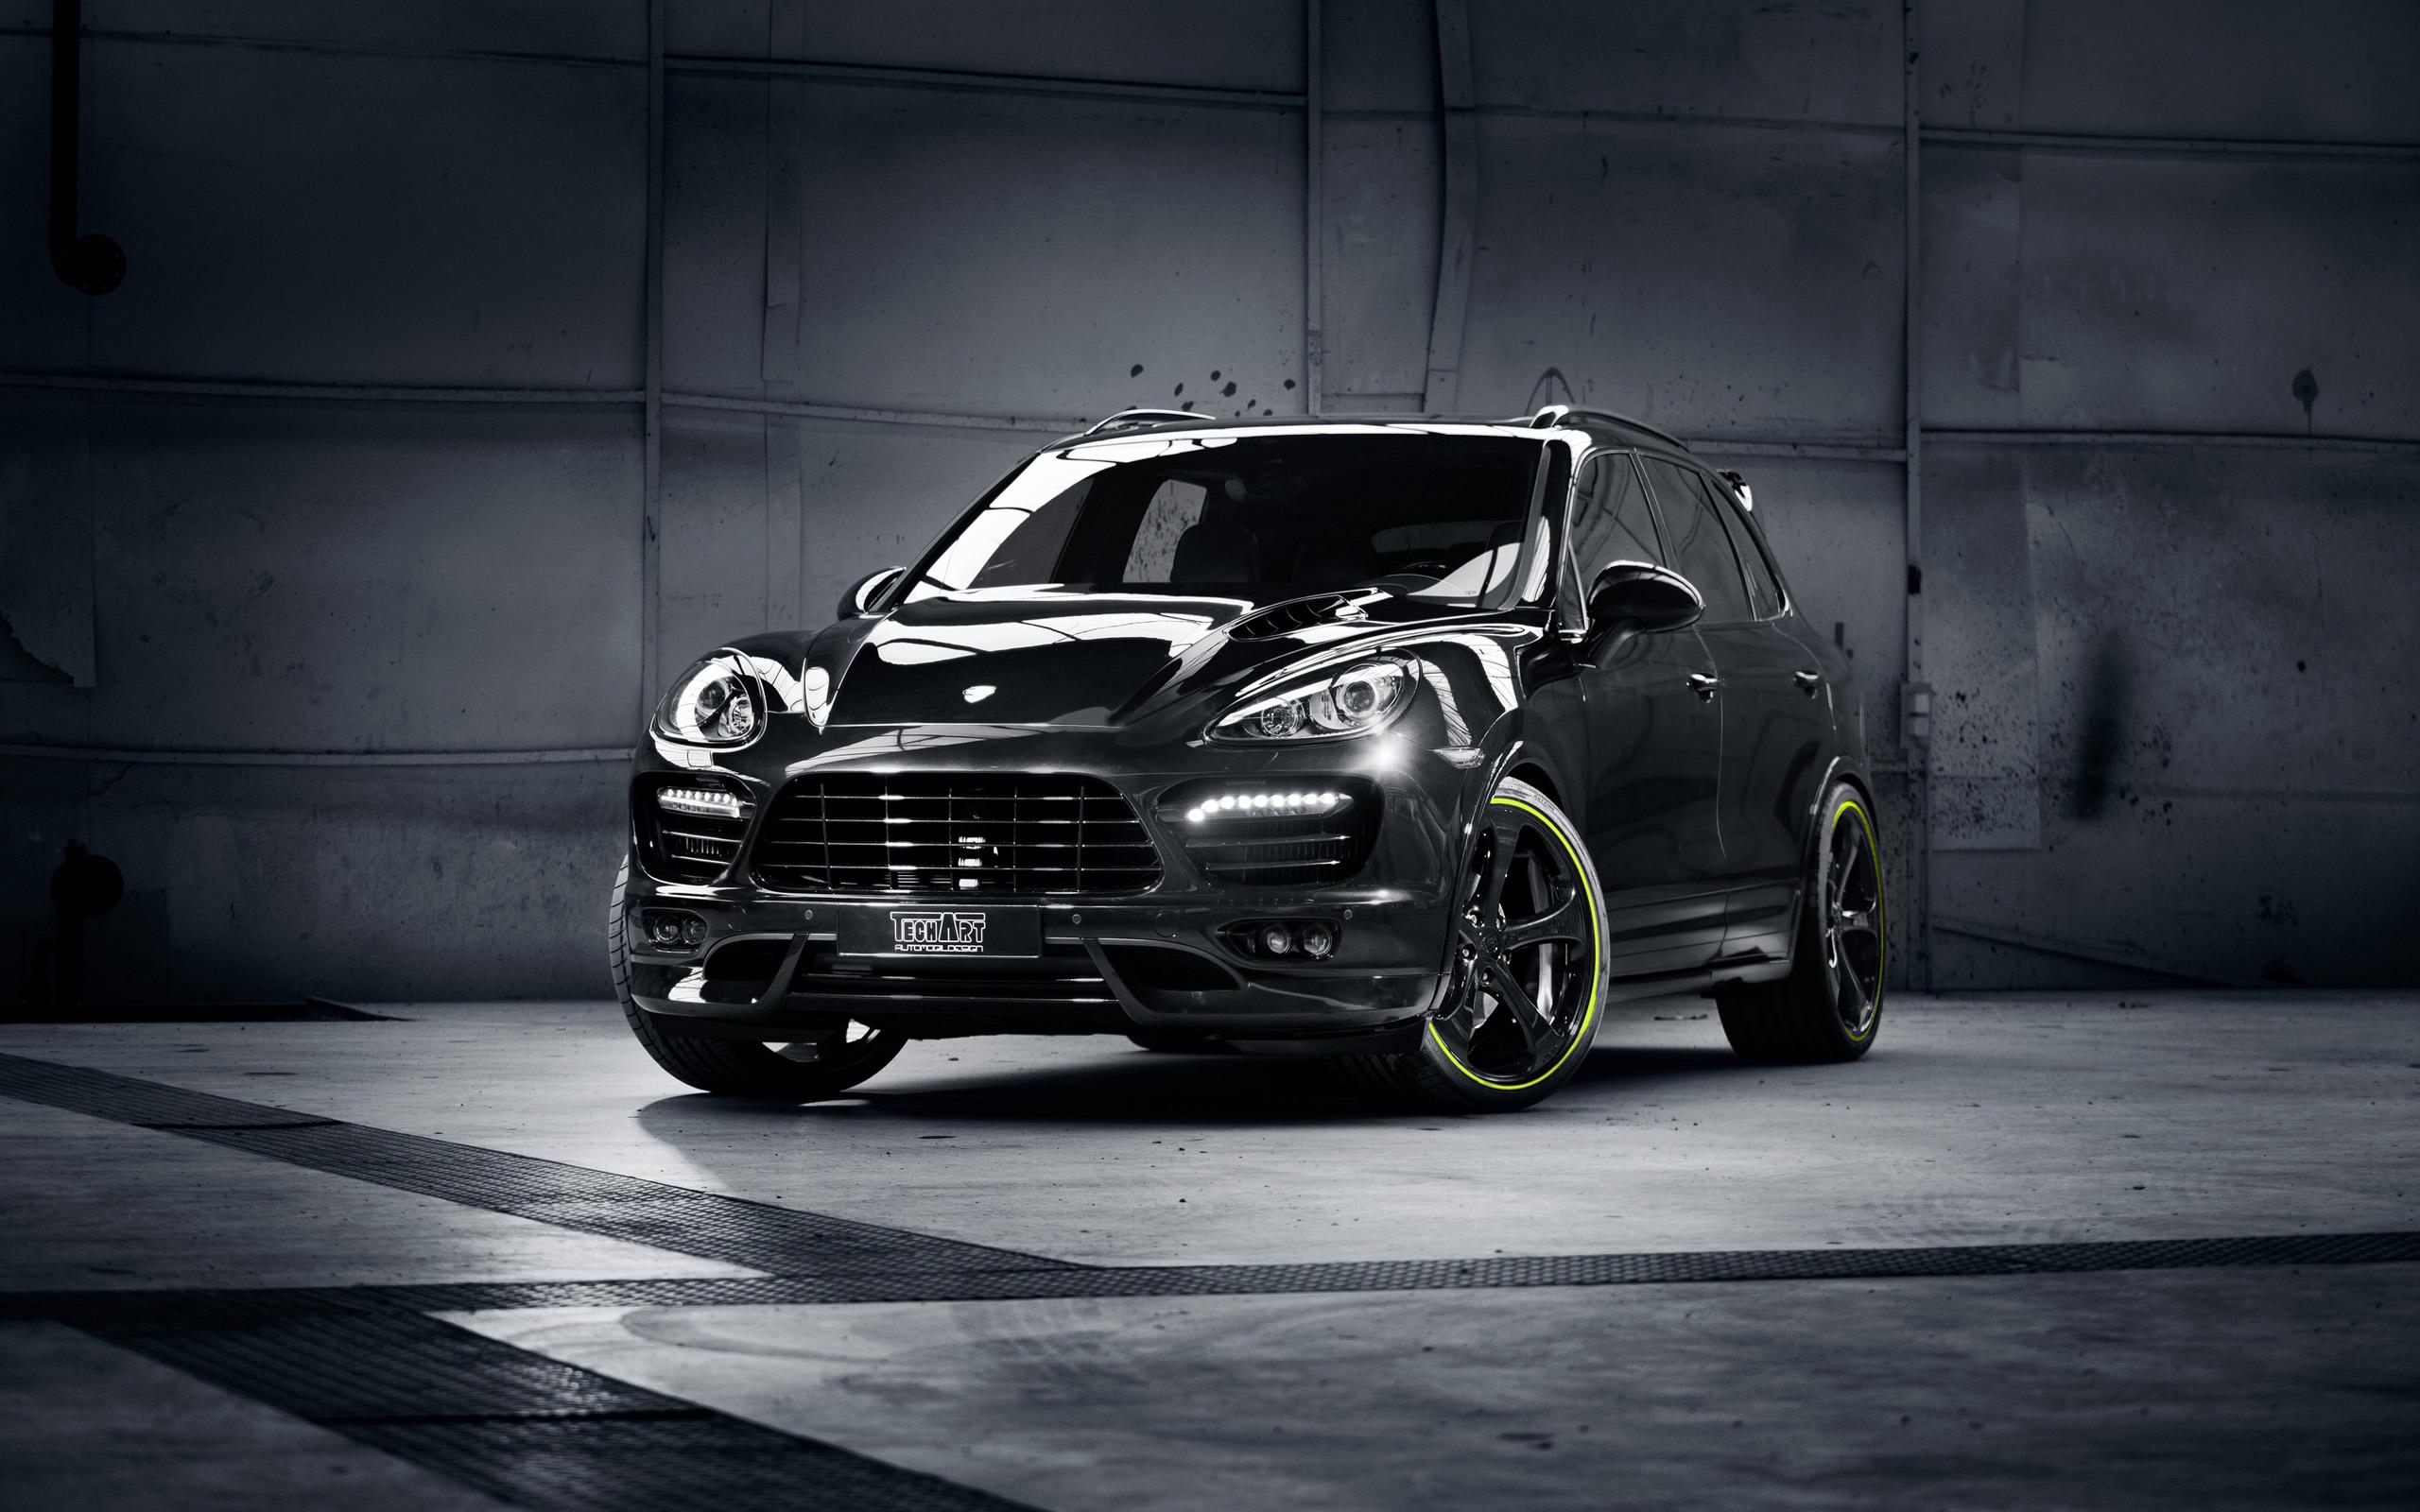 2013 techart porsche cayenne s diesel wallpaper hd car. Black Bedroom Furniture Sets. Home Design Ideas